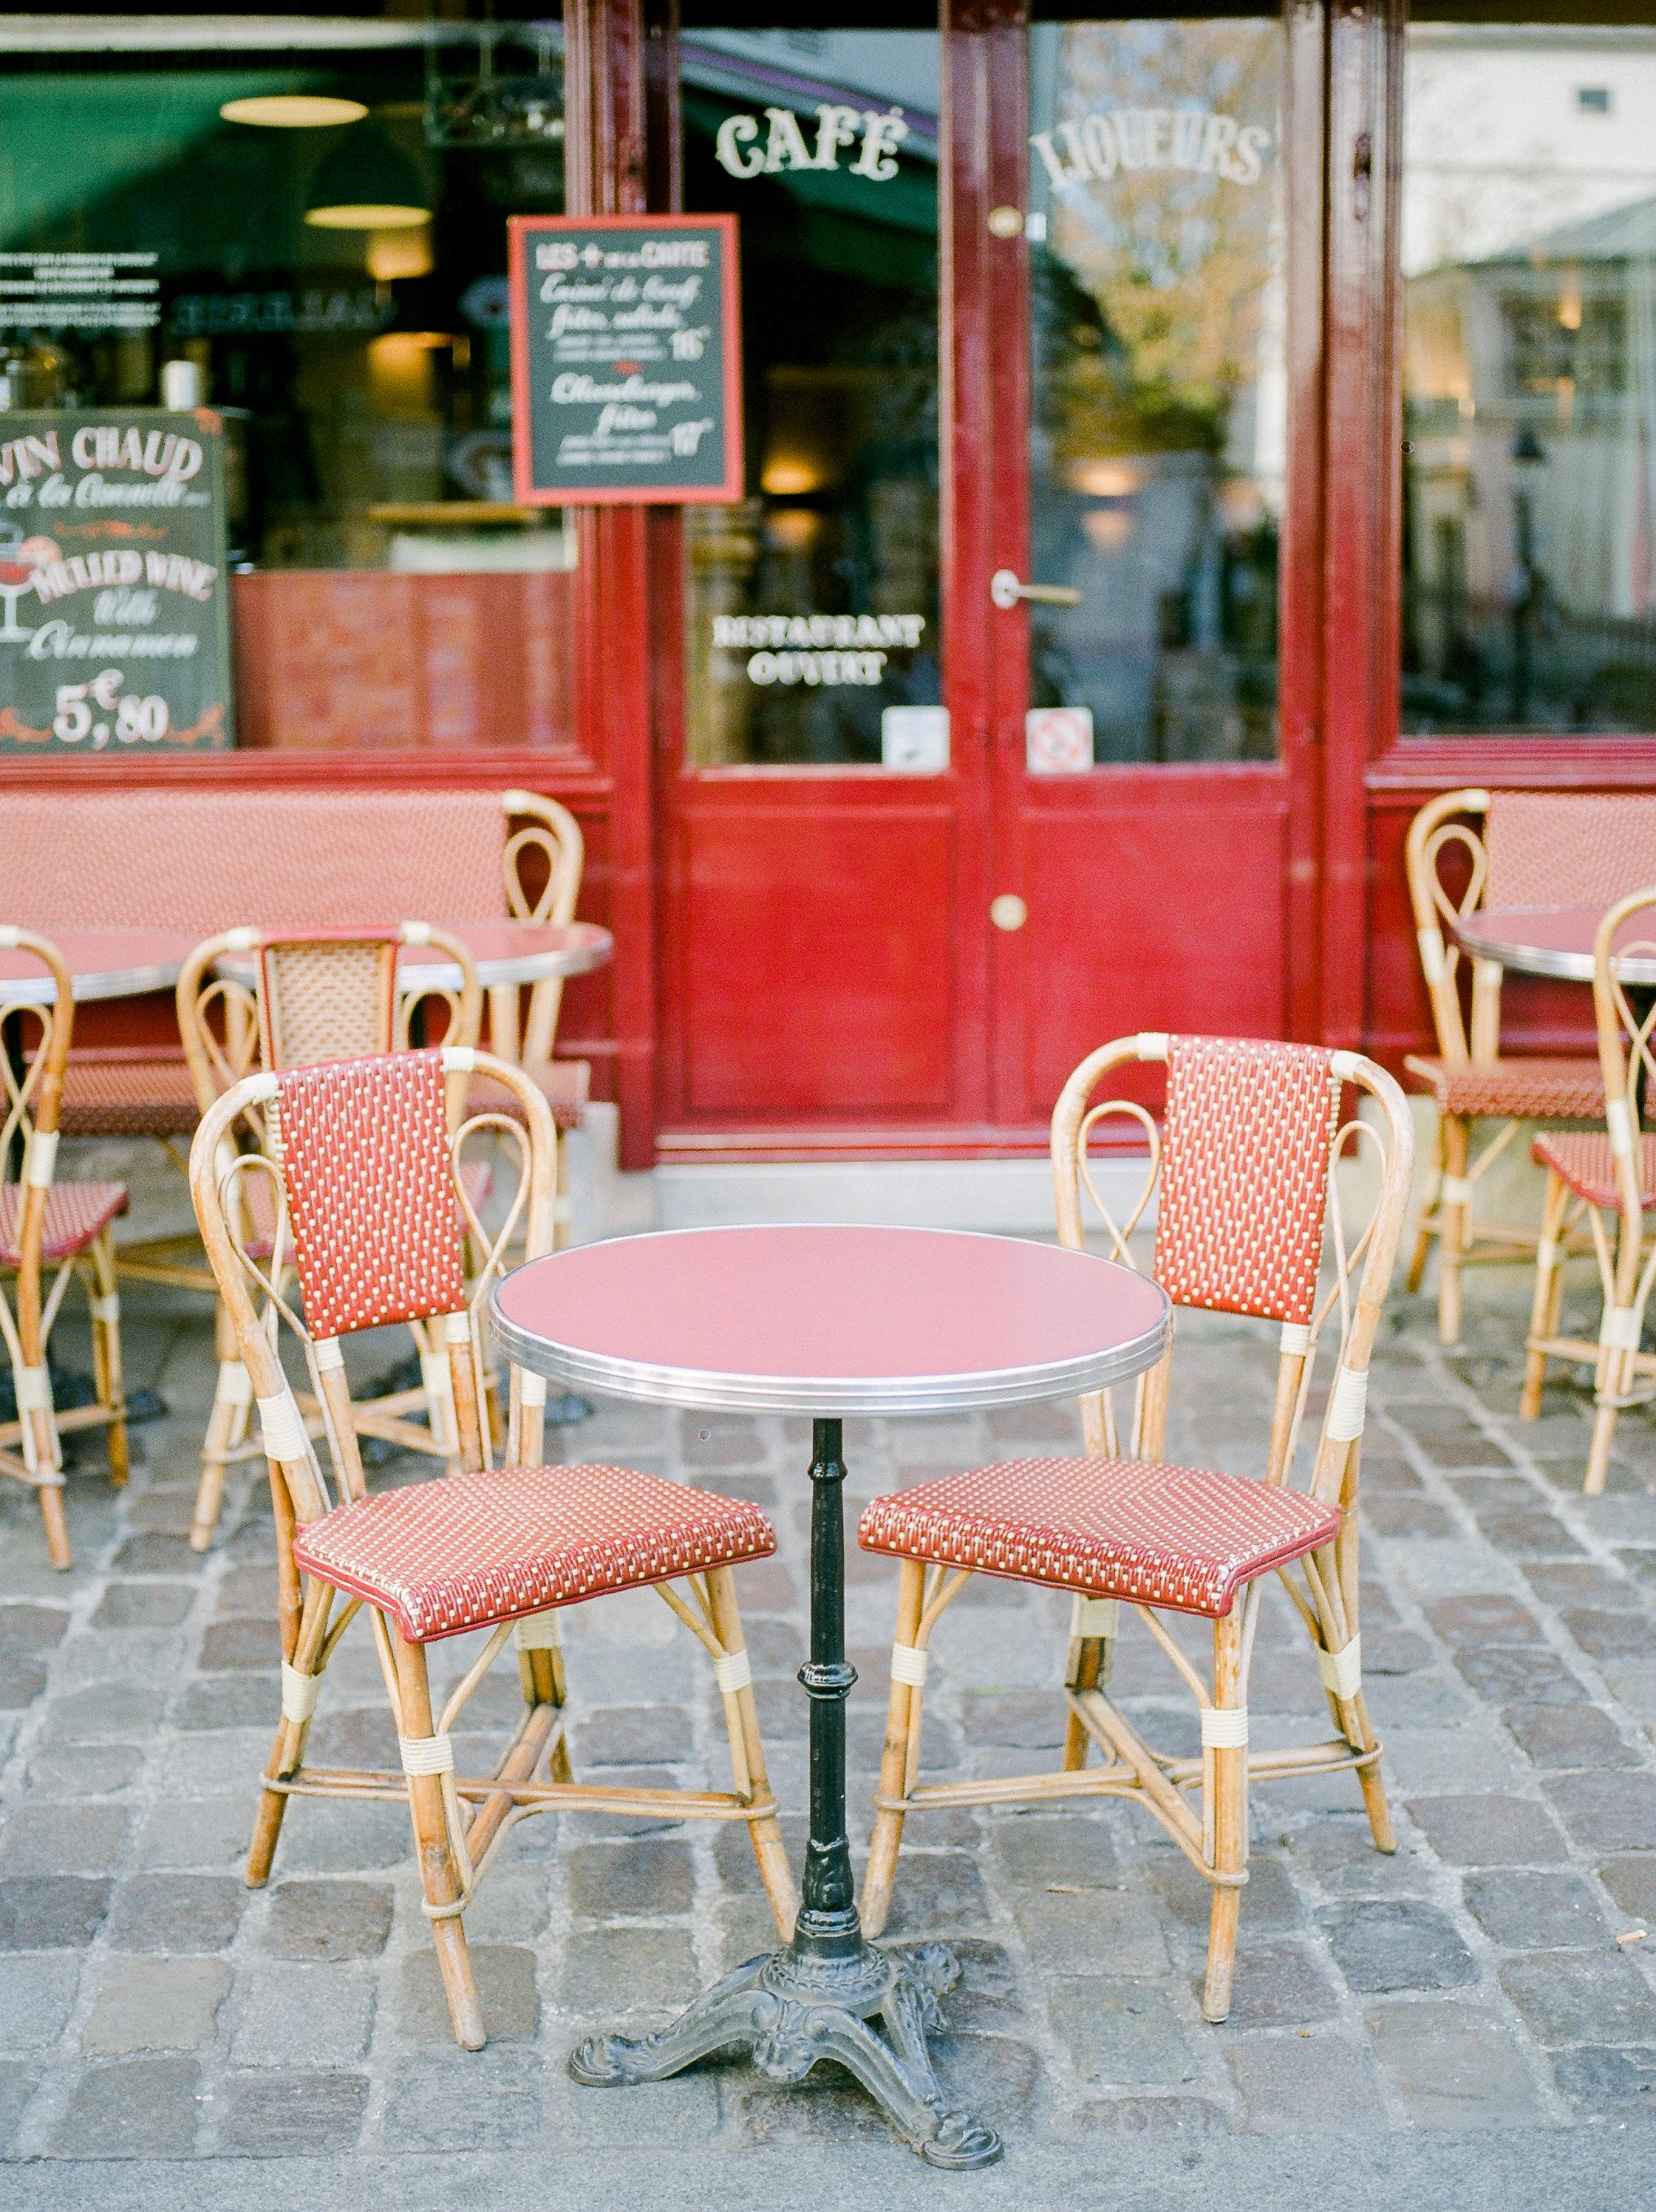 classic-red-chairs-at-paris-café.jpg